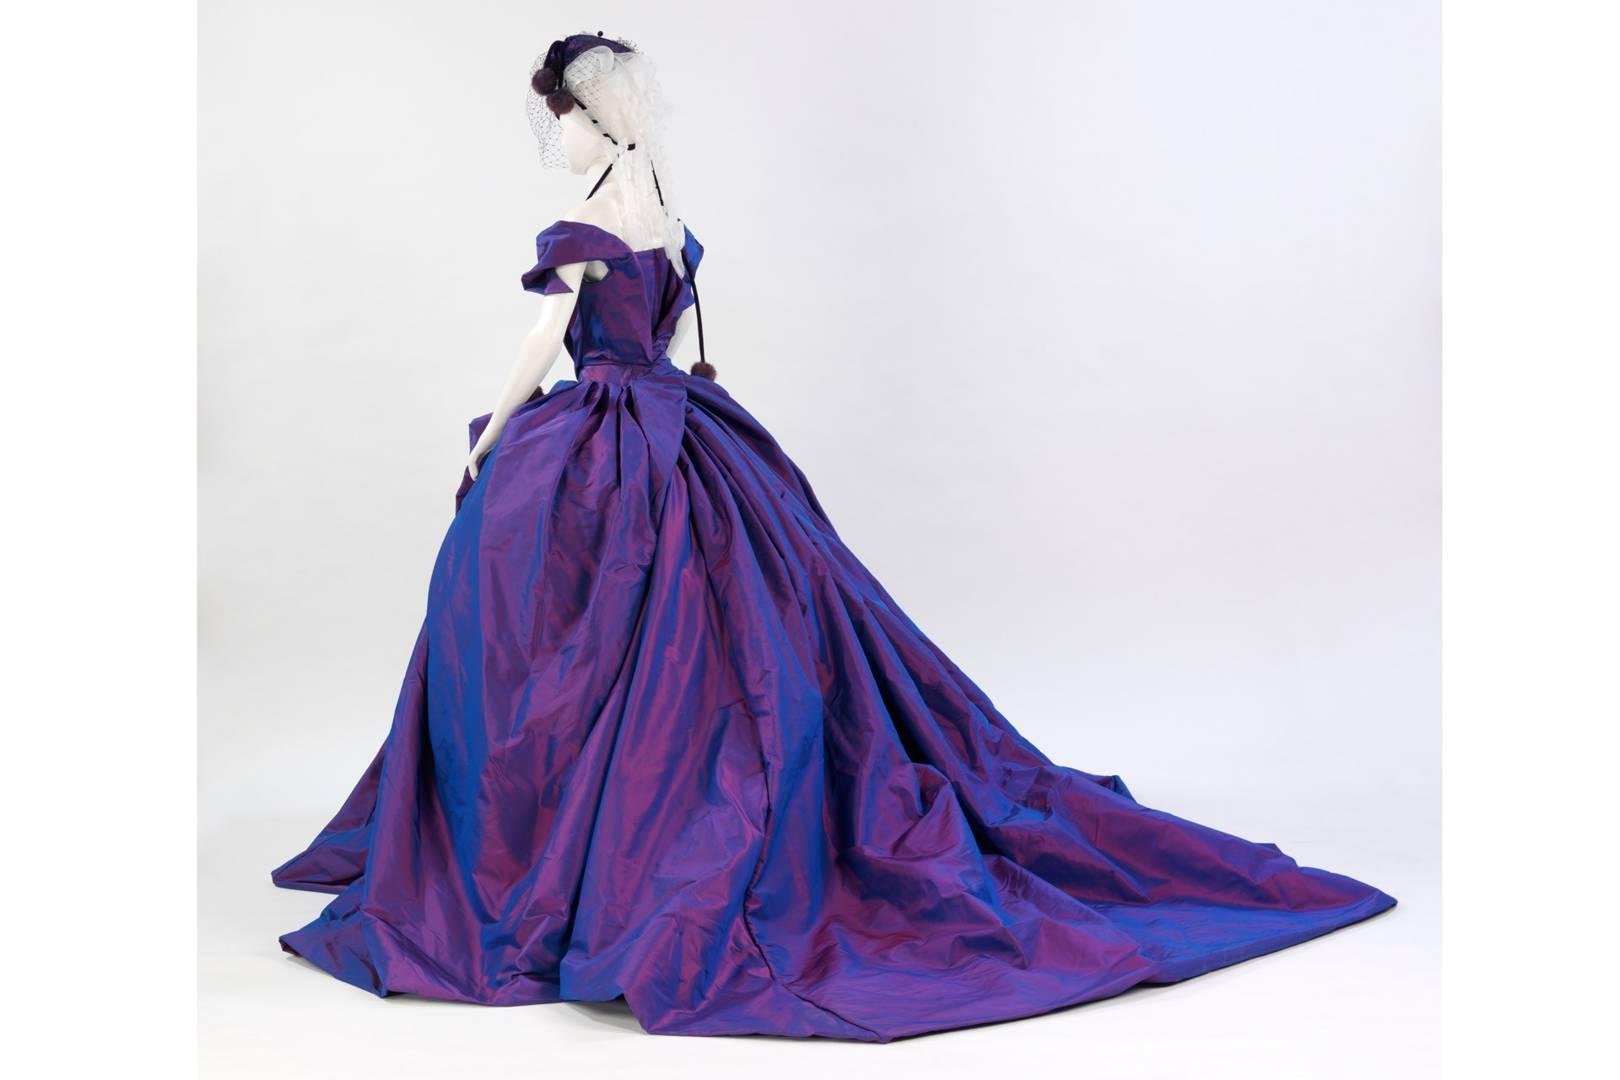 celebrity wedding dresses - dita von teese, gwen stefani, kate